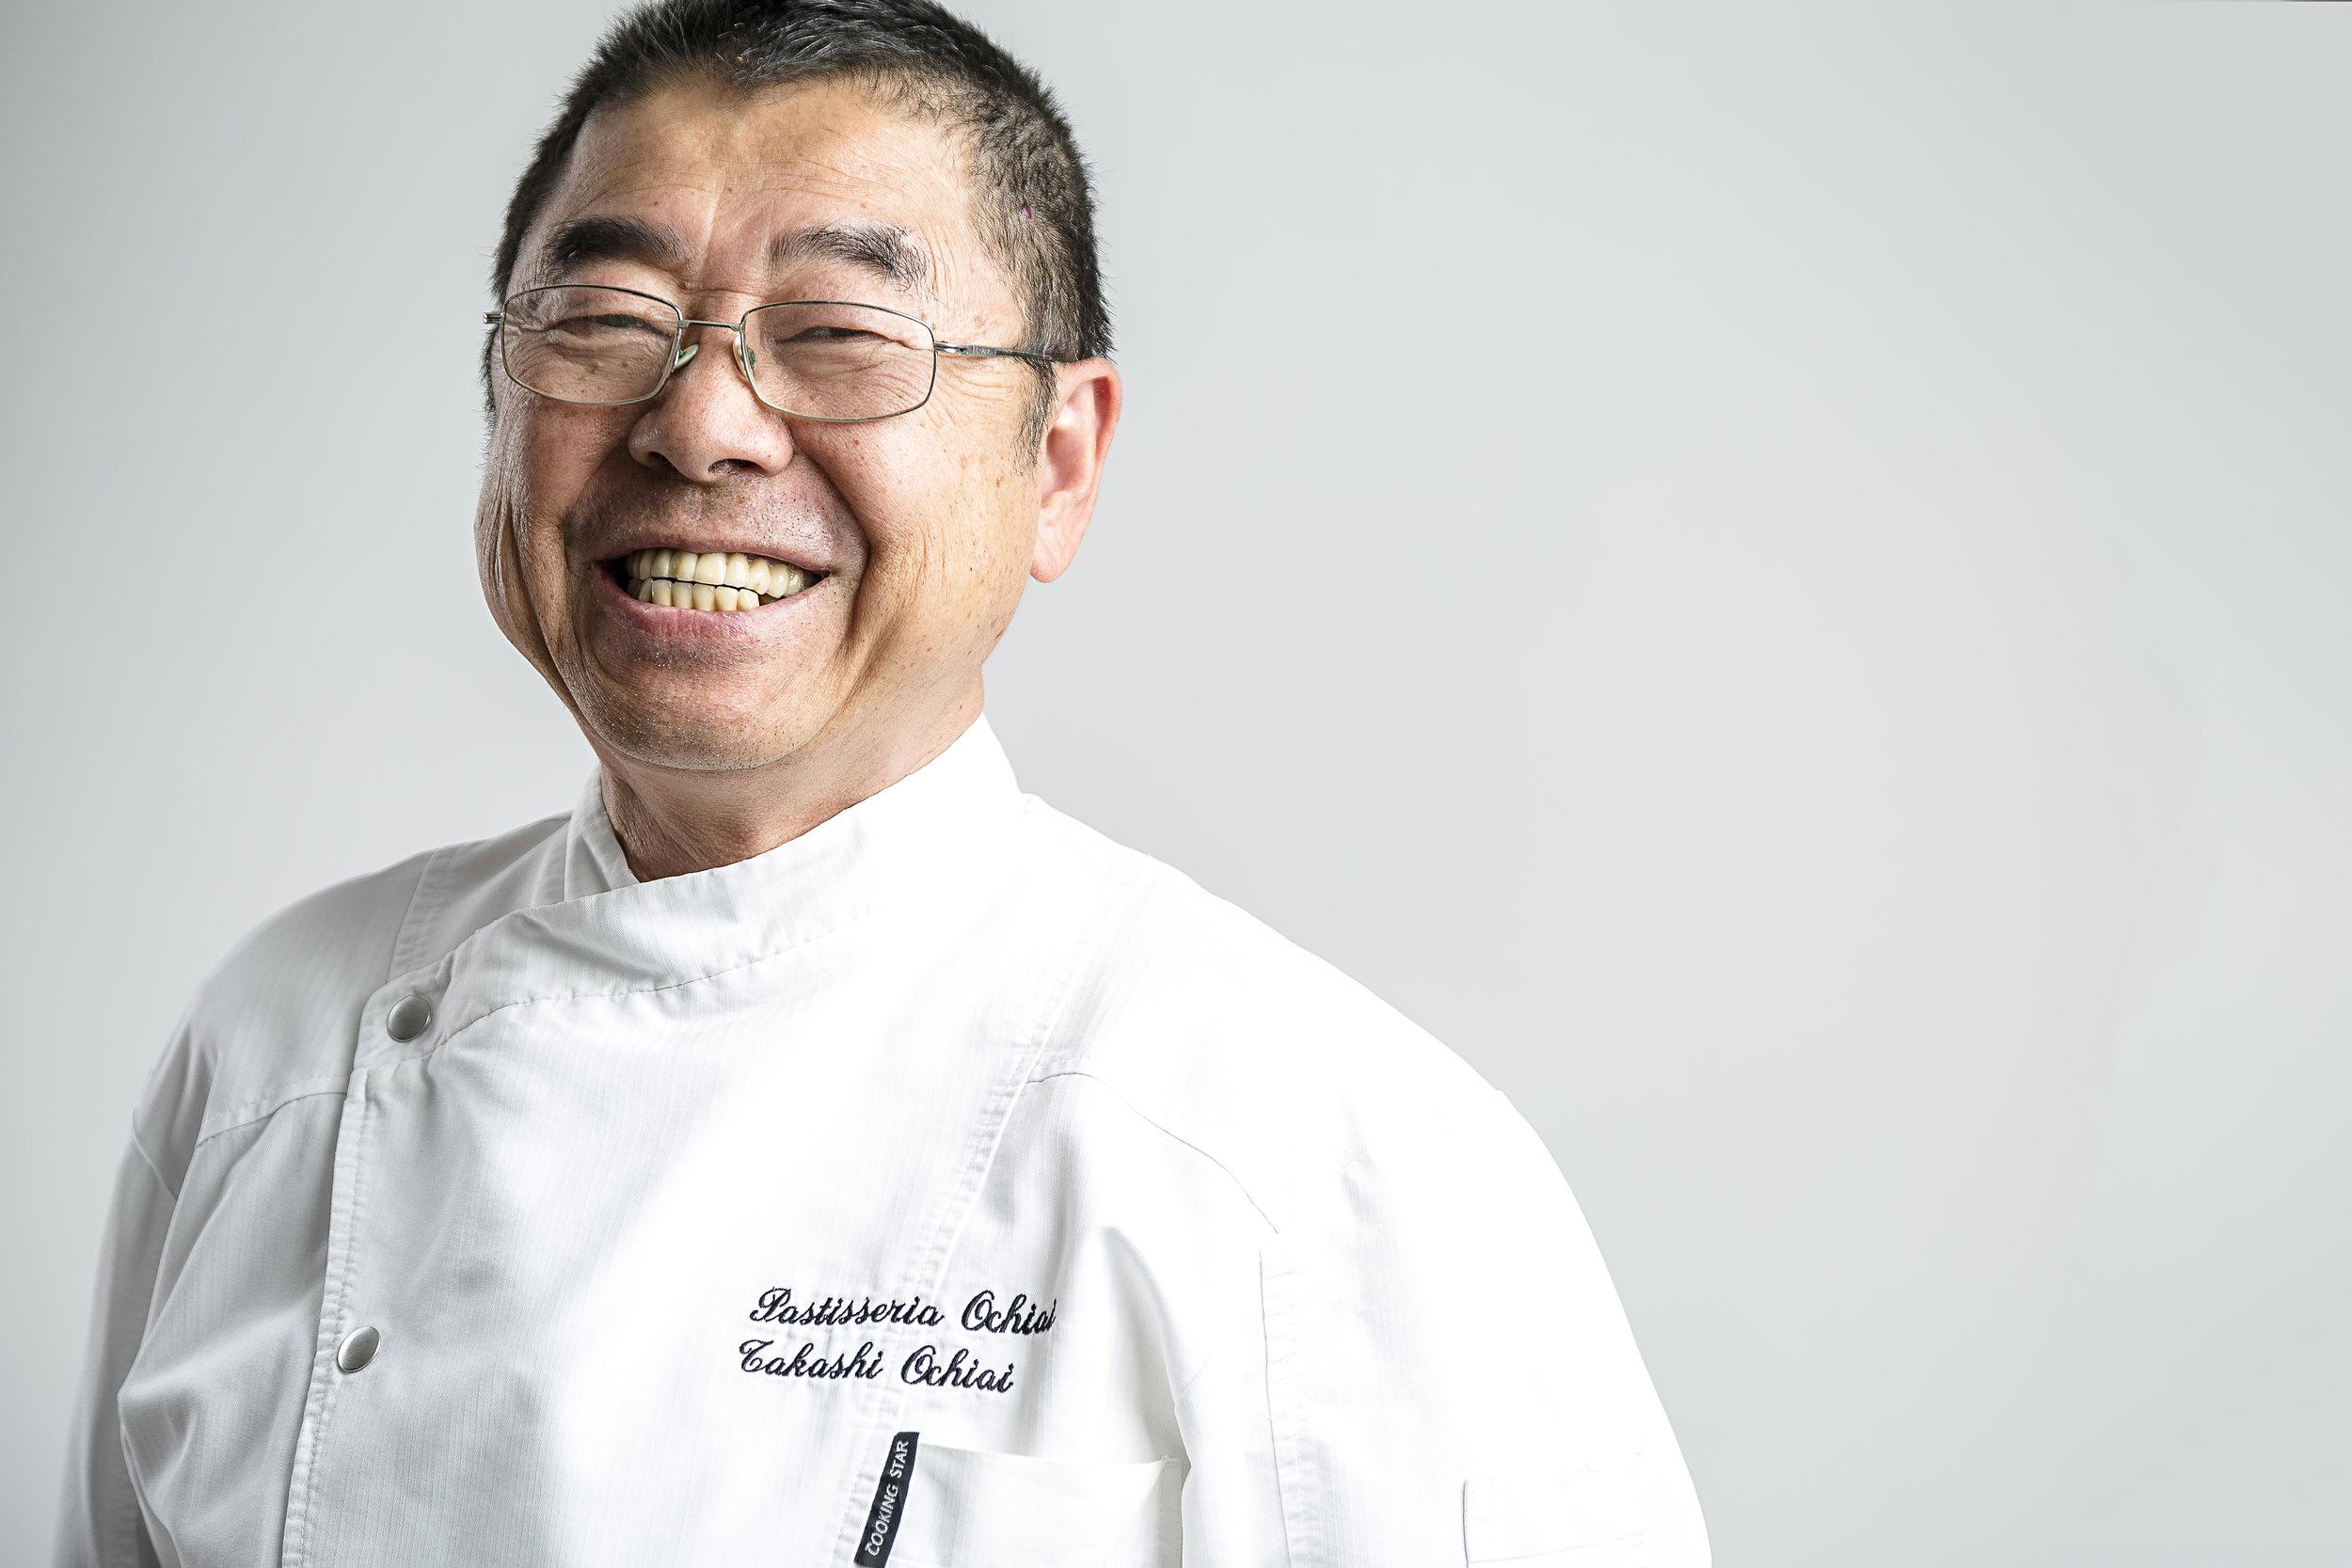 Takashi Ochiai.